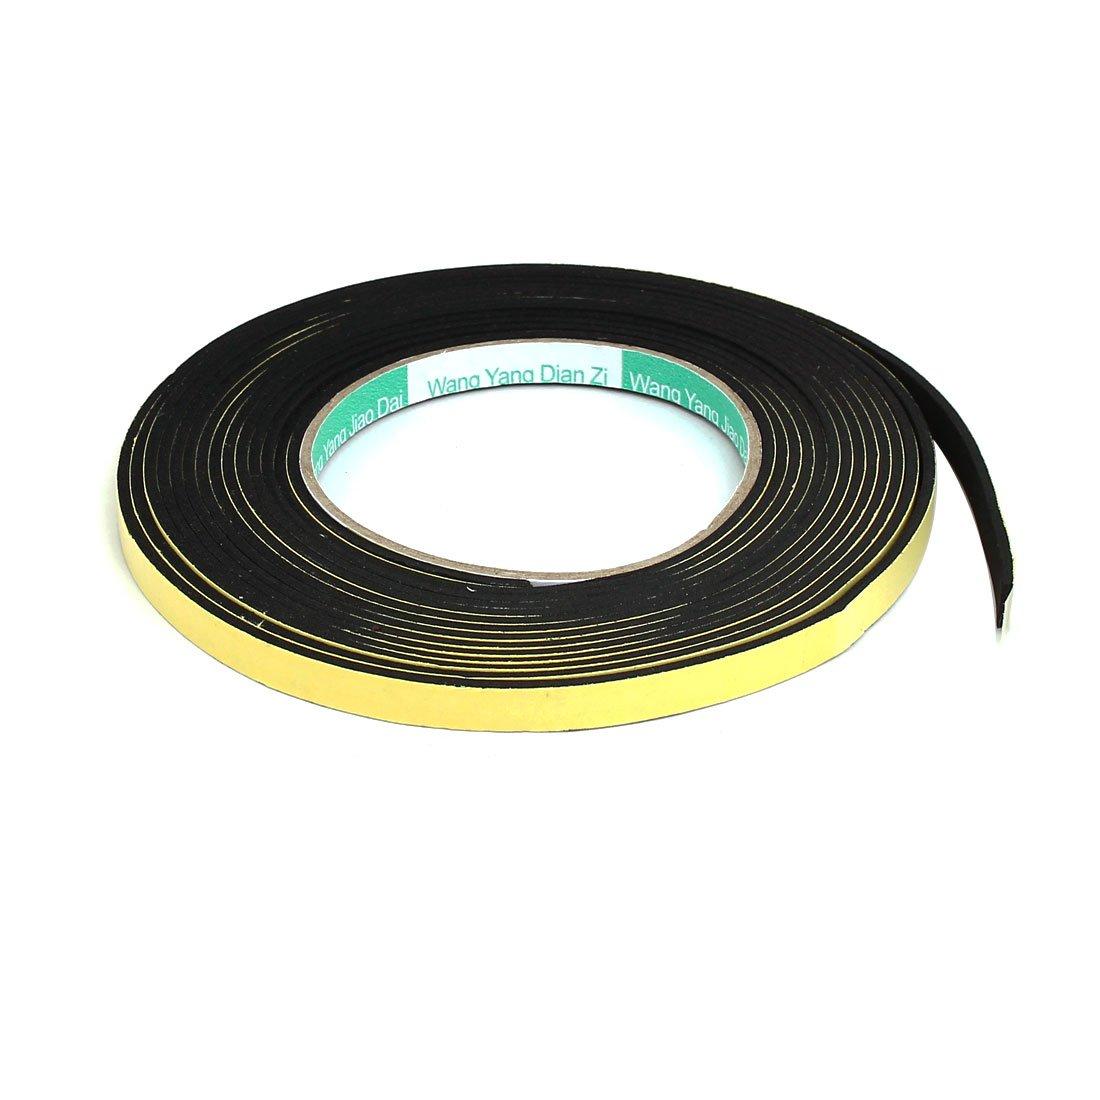 uxcell 8mmx2mm Singel Sided Sponge Tape Adhesive Sticker Foam Glue Strip Sealing 5 Meters a17050200ux0740